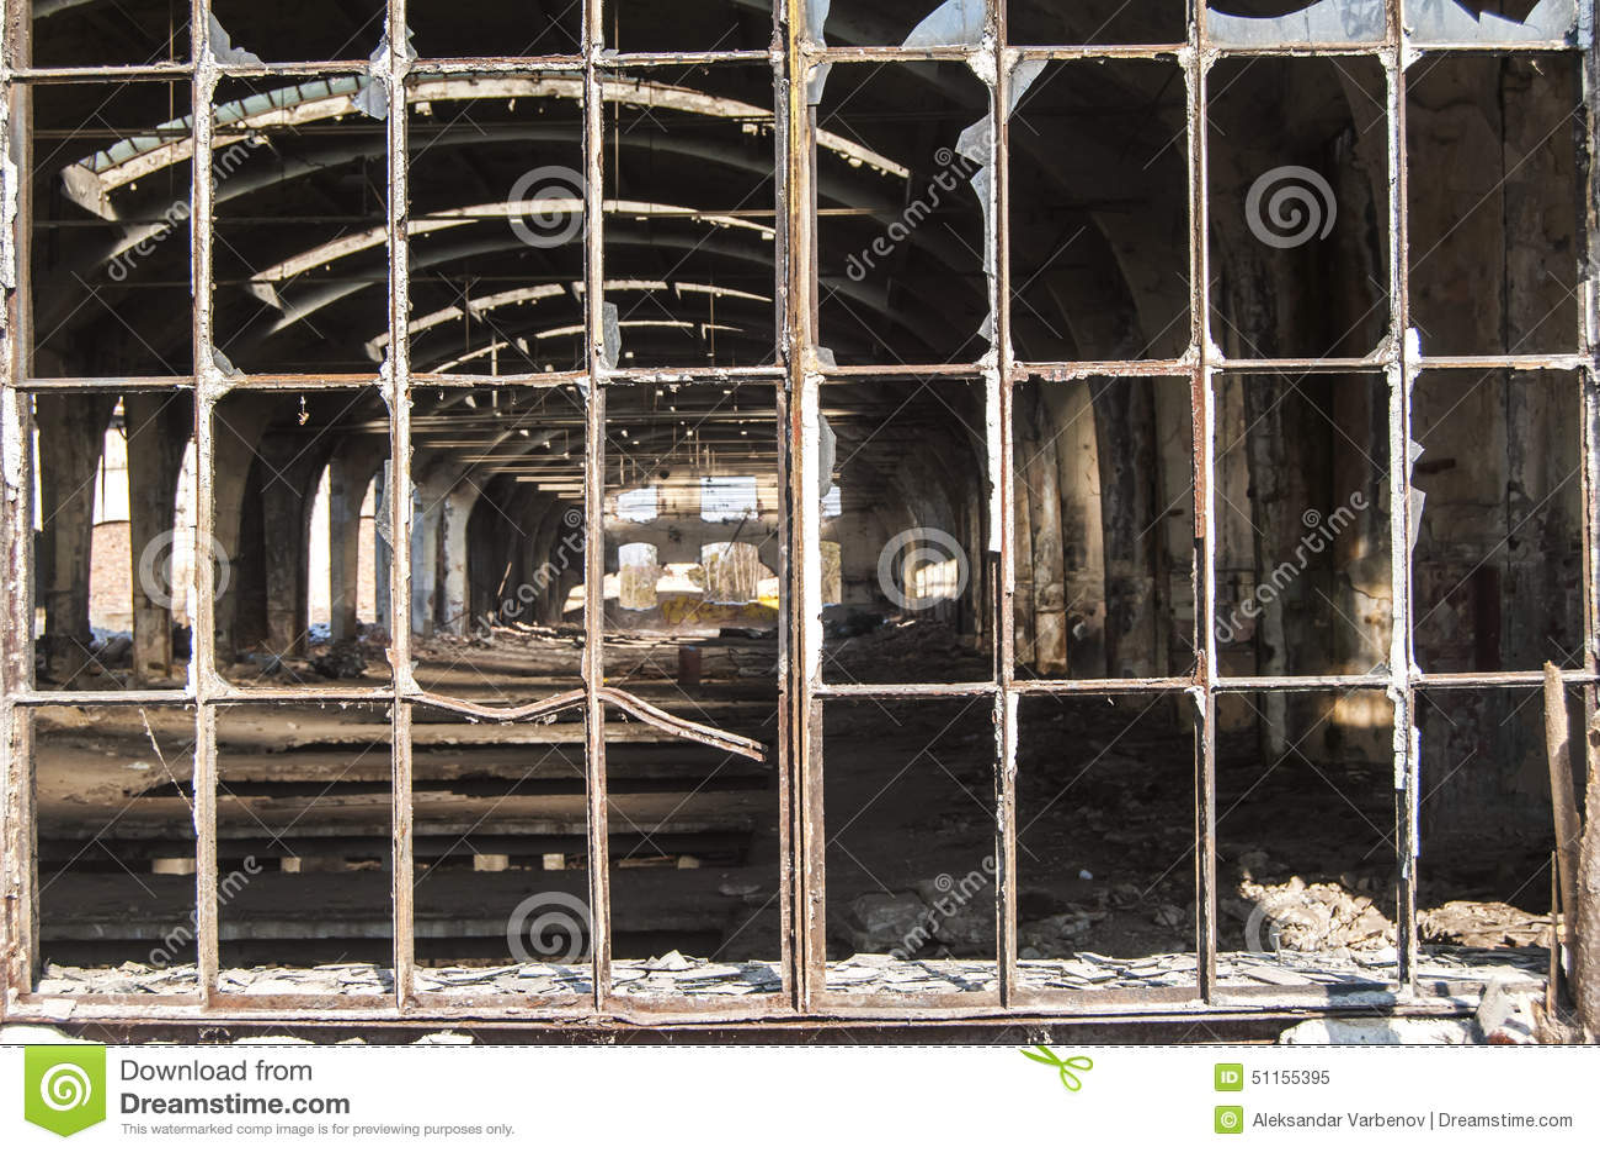 Old Grunge Metal Window Frame Stock Image - Image of pane, window ...